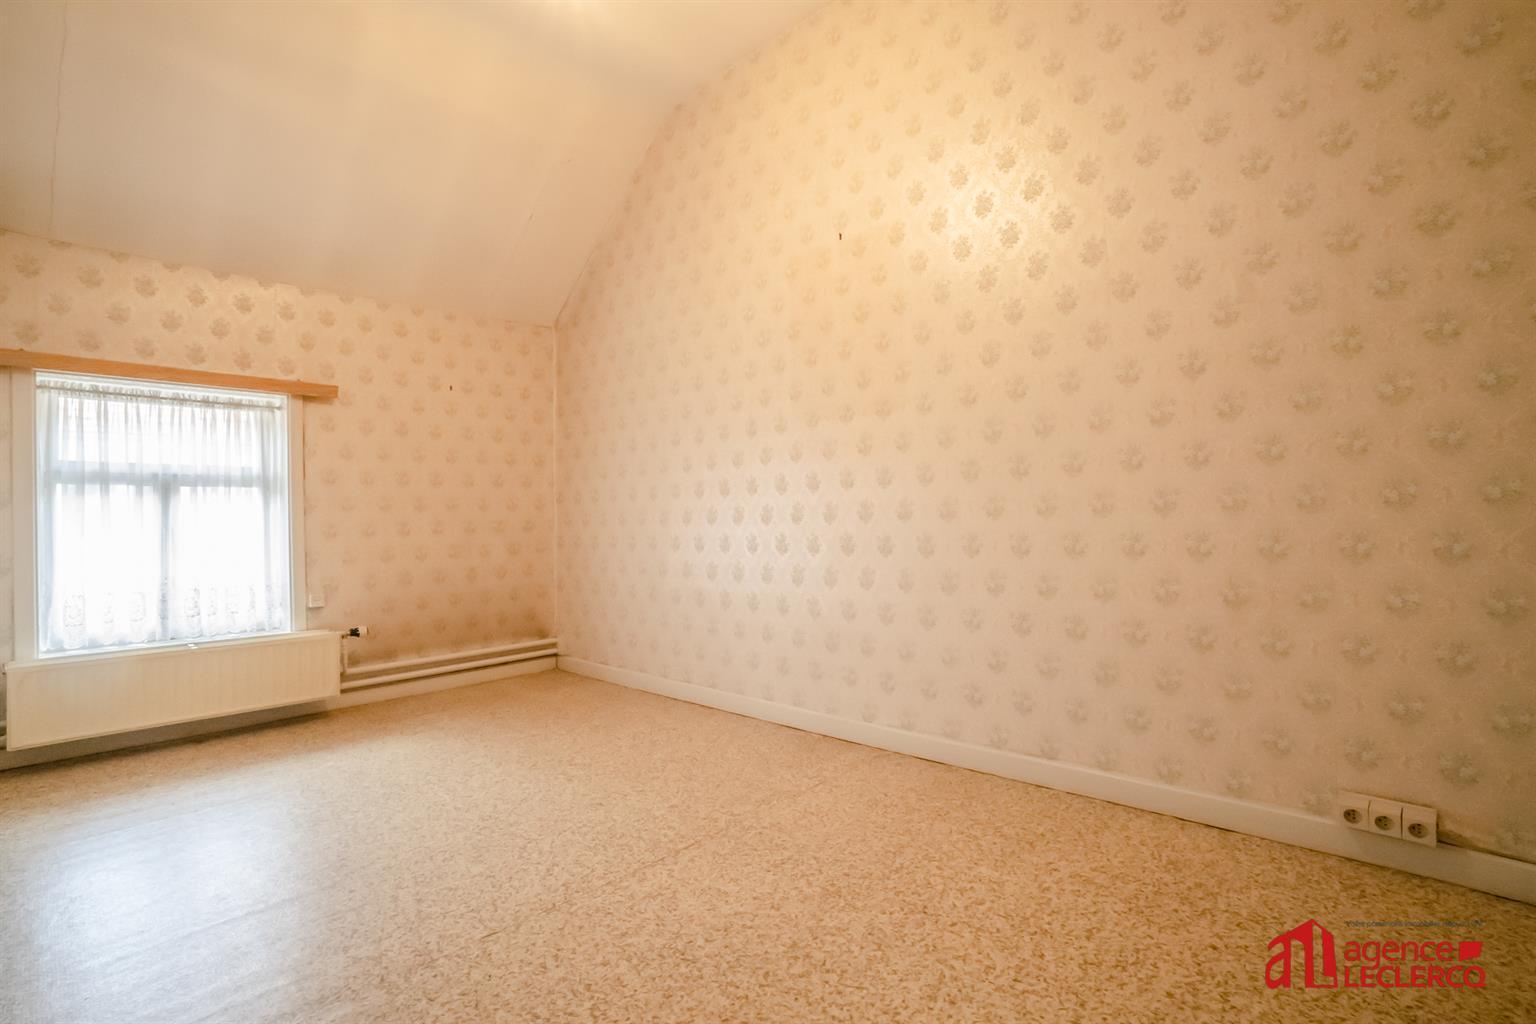 Maison - Bernissart Blaton - #4371908-41